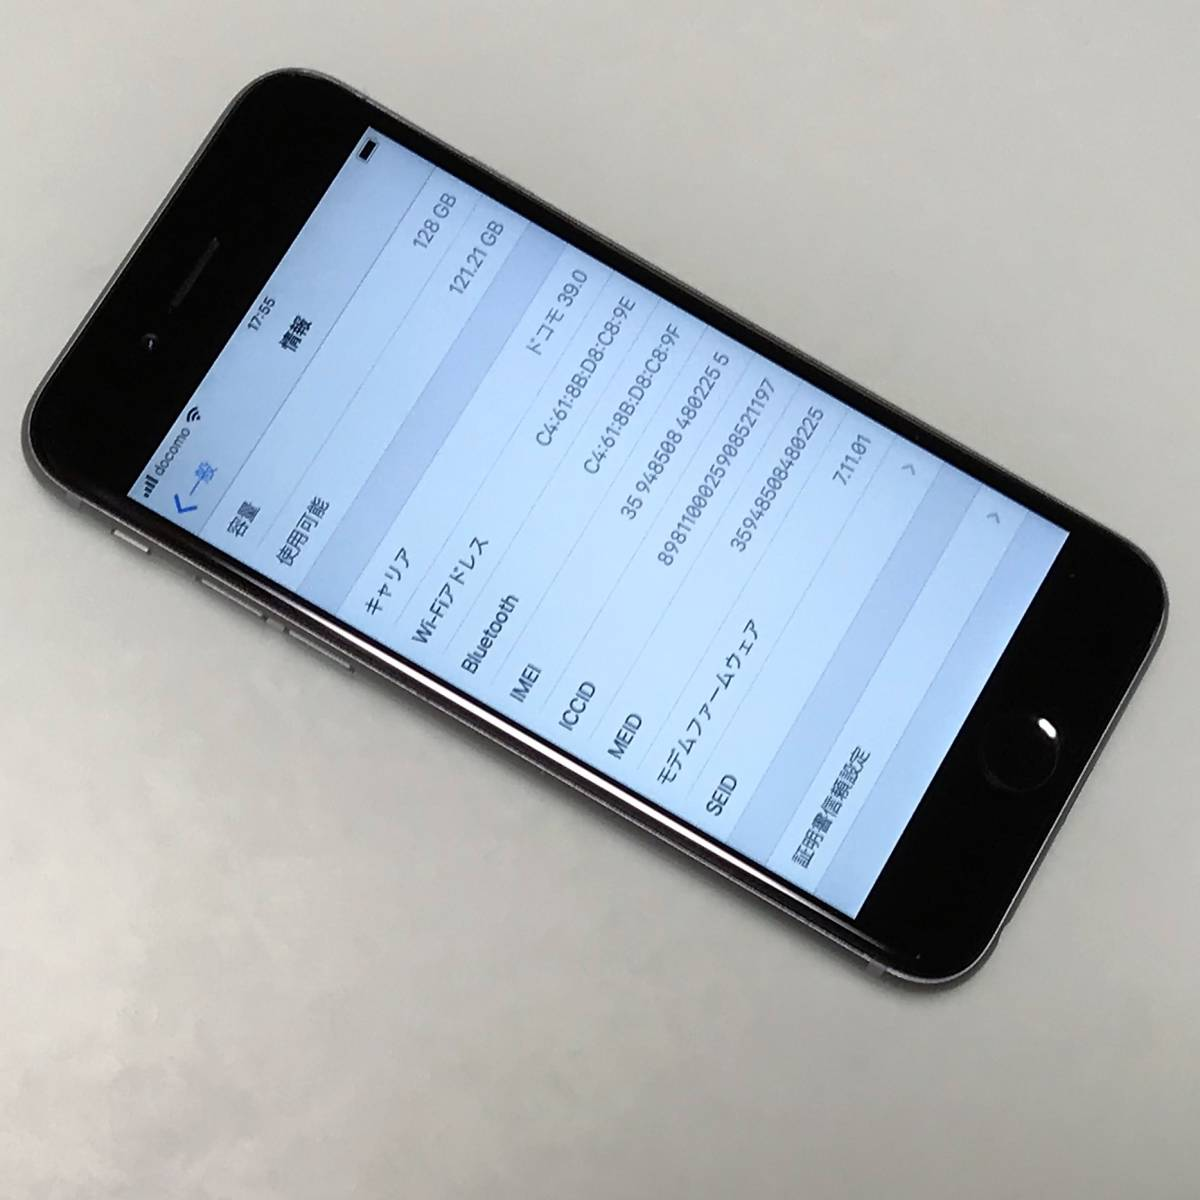 SIMフリー iPhone 6S スペースグレイ 128GB MKQT2J/A バッテリー容量100% アクティベーションロック解除済 docomo MVNO可 SIMロック解除済_画像3